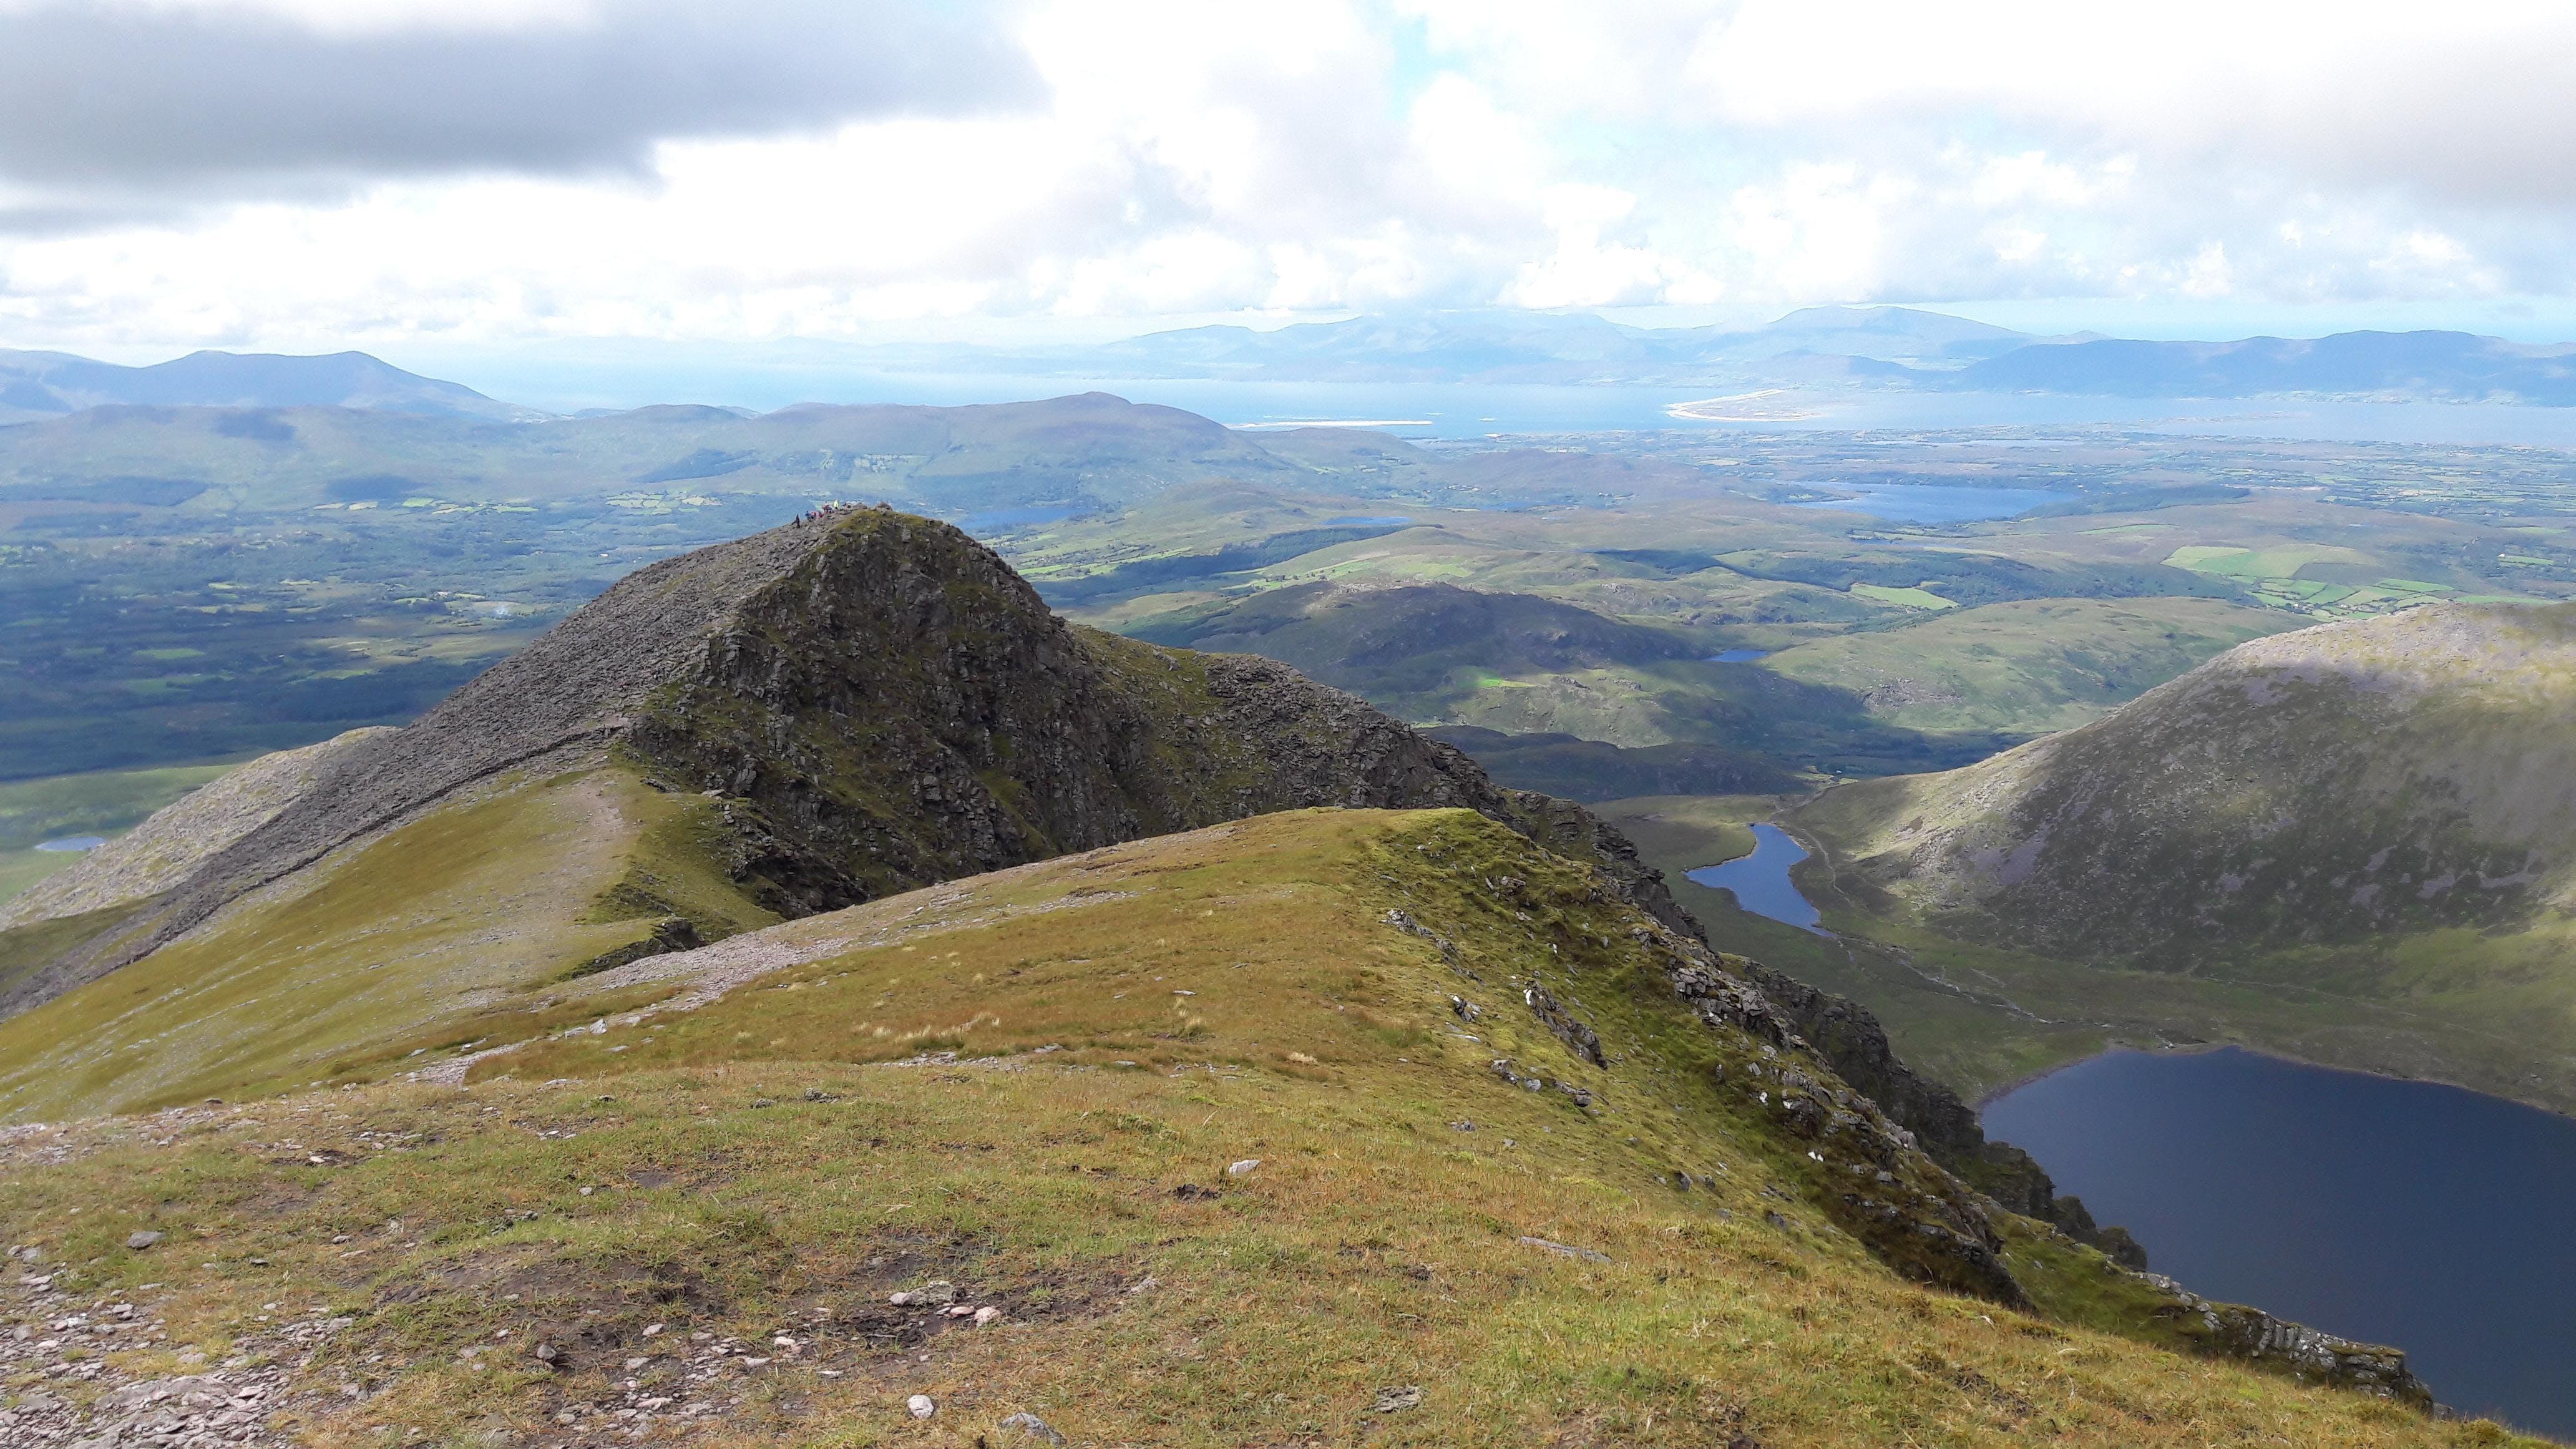 Climb Carrauntoohil: 20th May